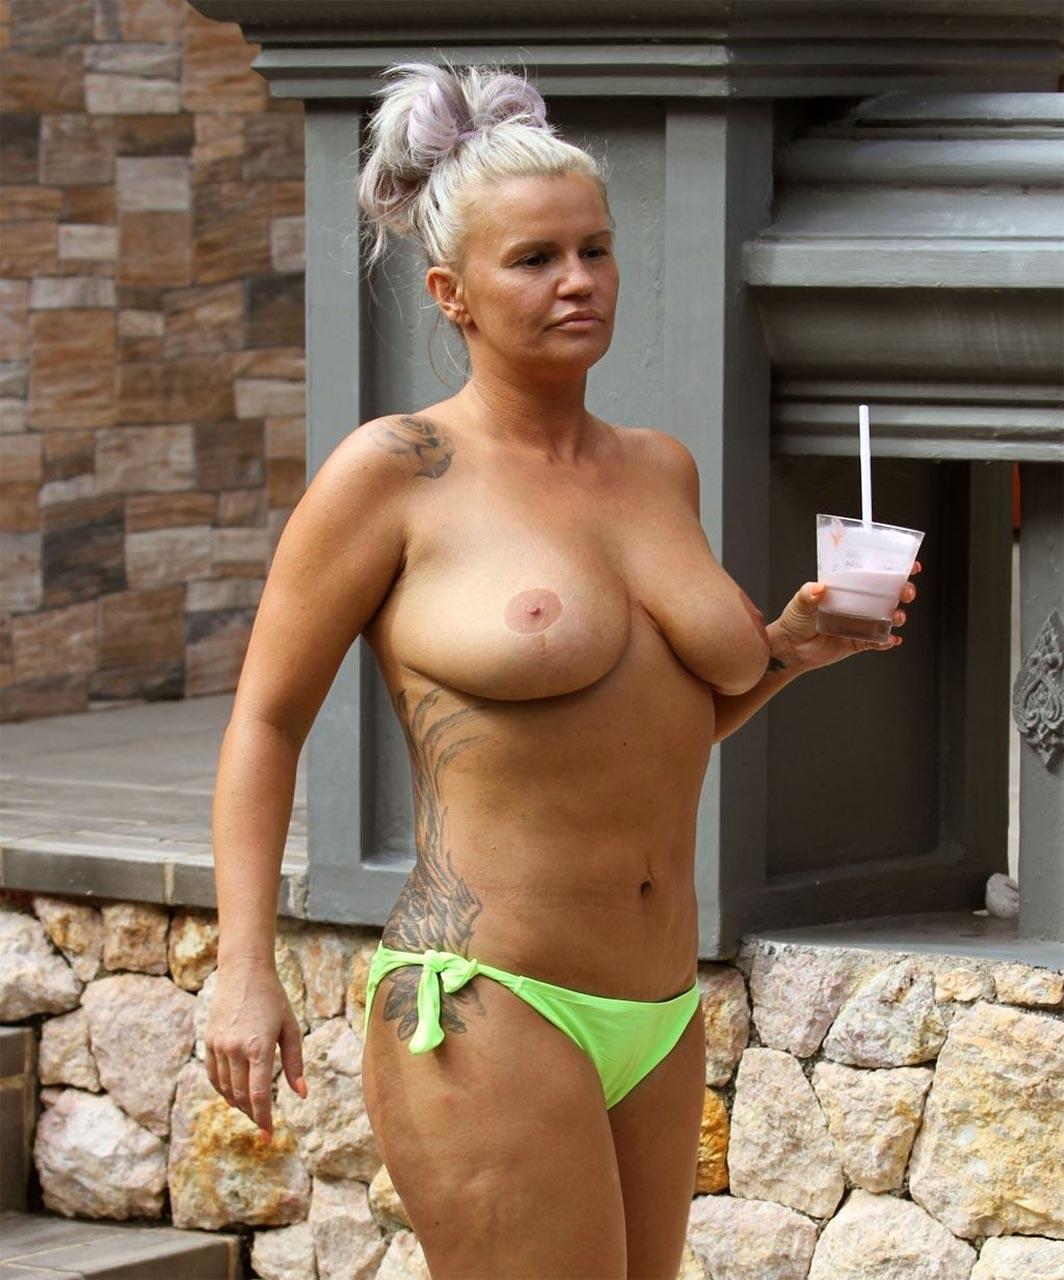 That can Kerry katona naked pics not